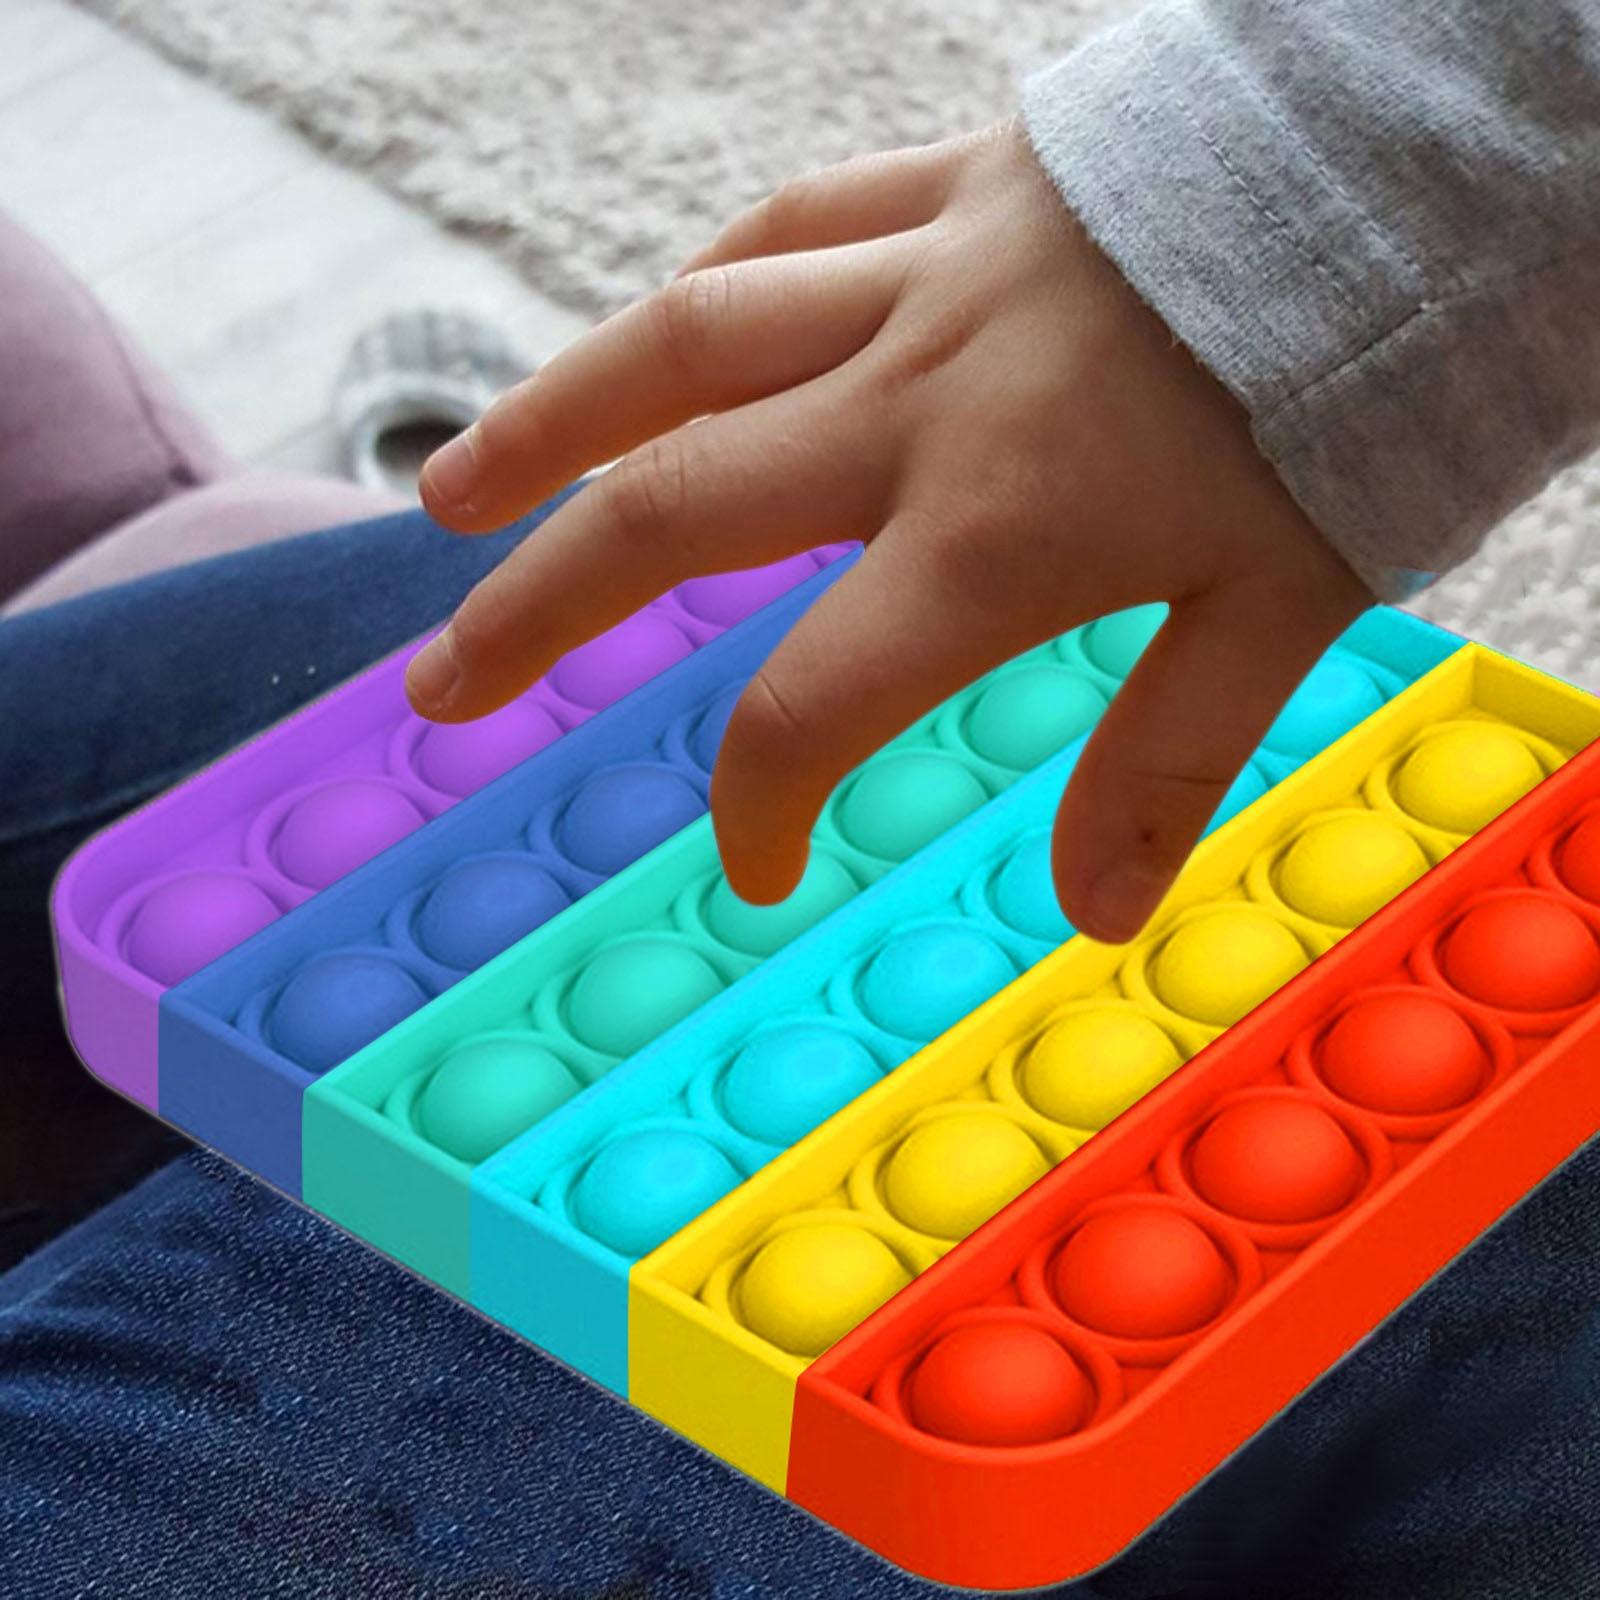 Fidget Sensory Autism Squeeze Antistresse Squishy Special-Needs Popit Adult Hot Push